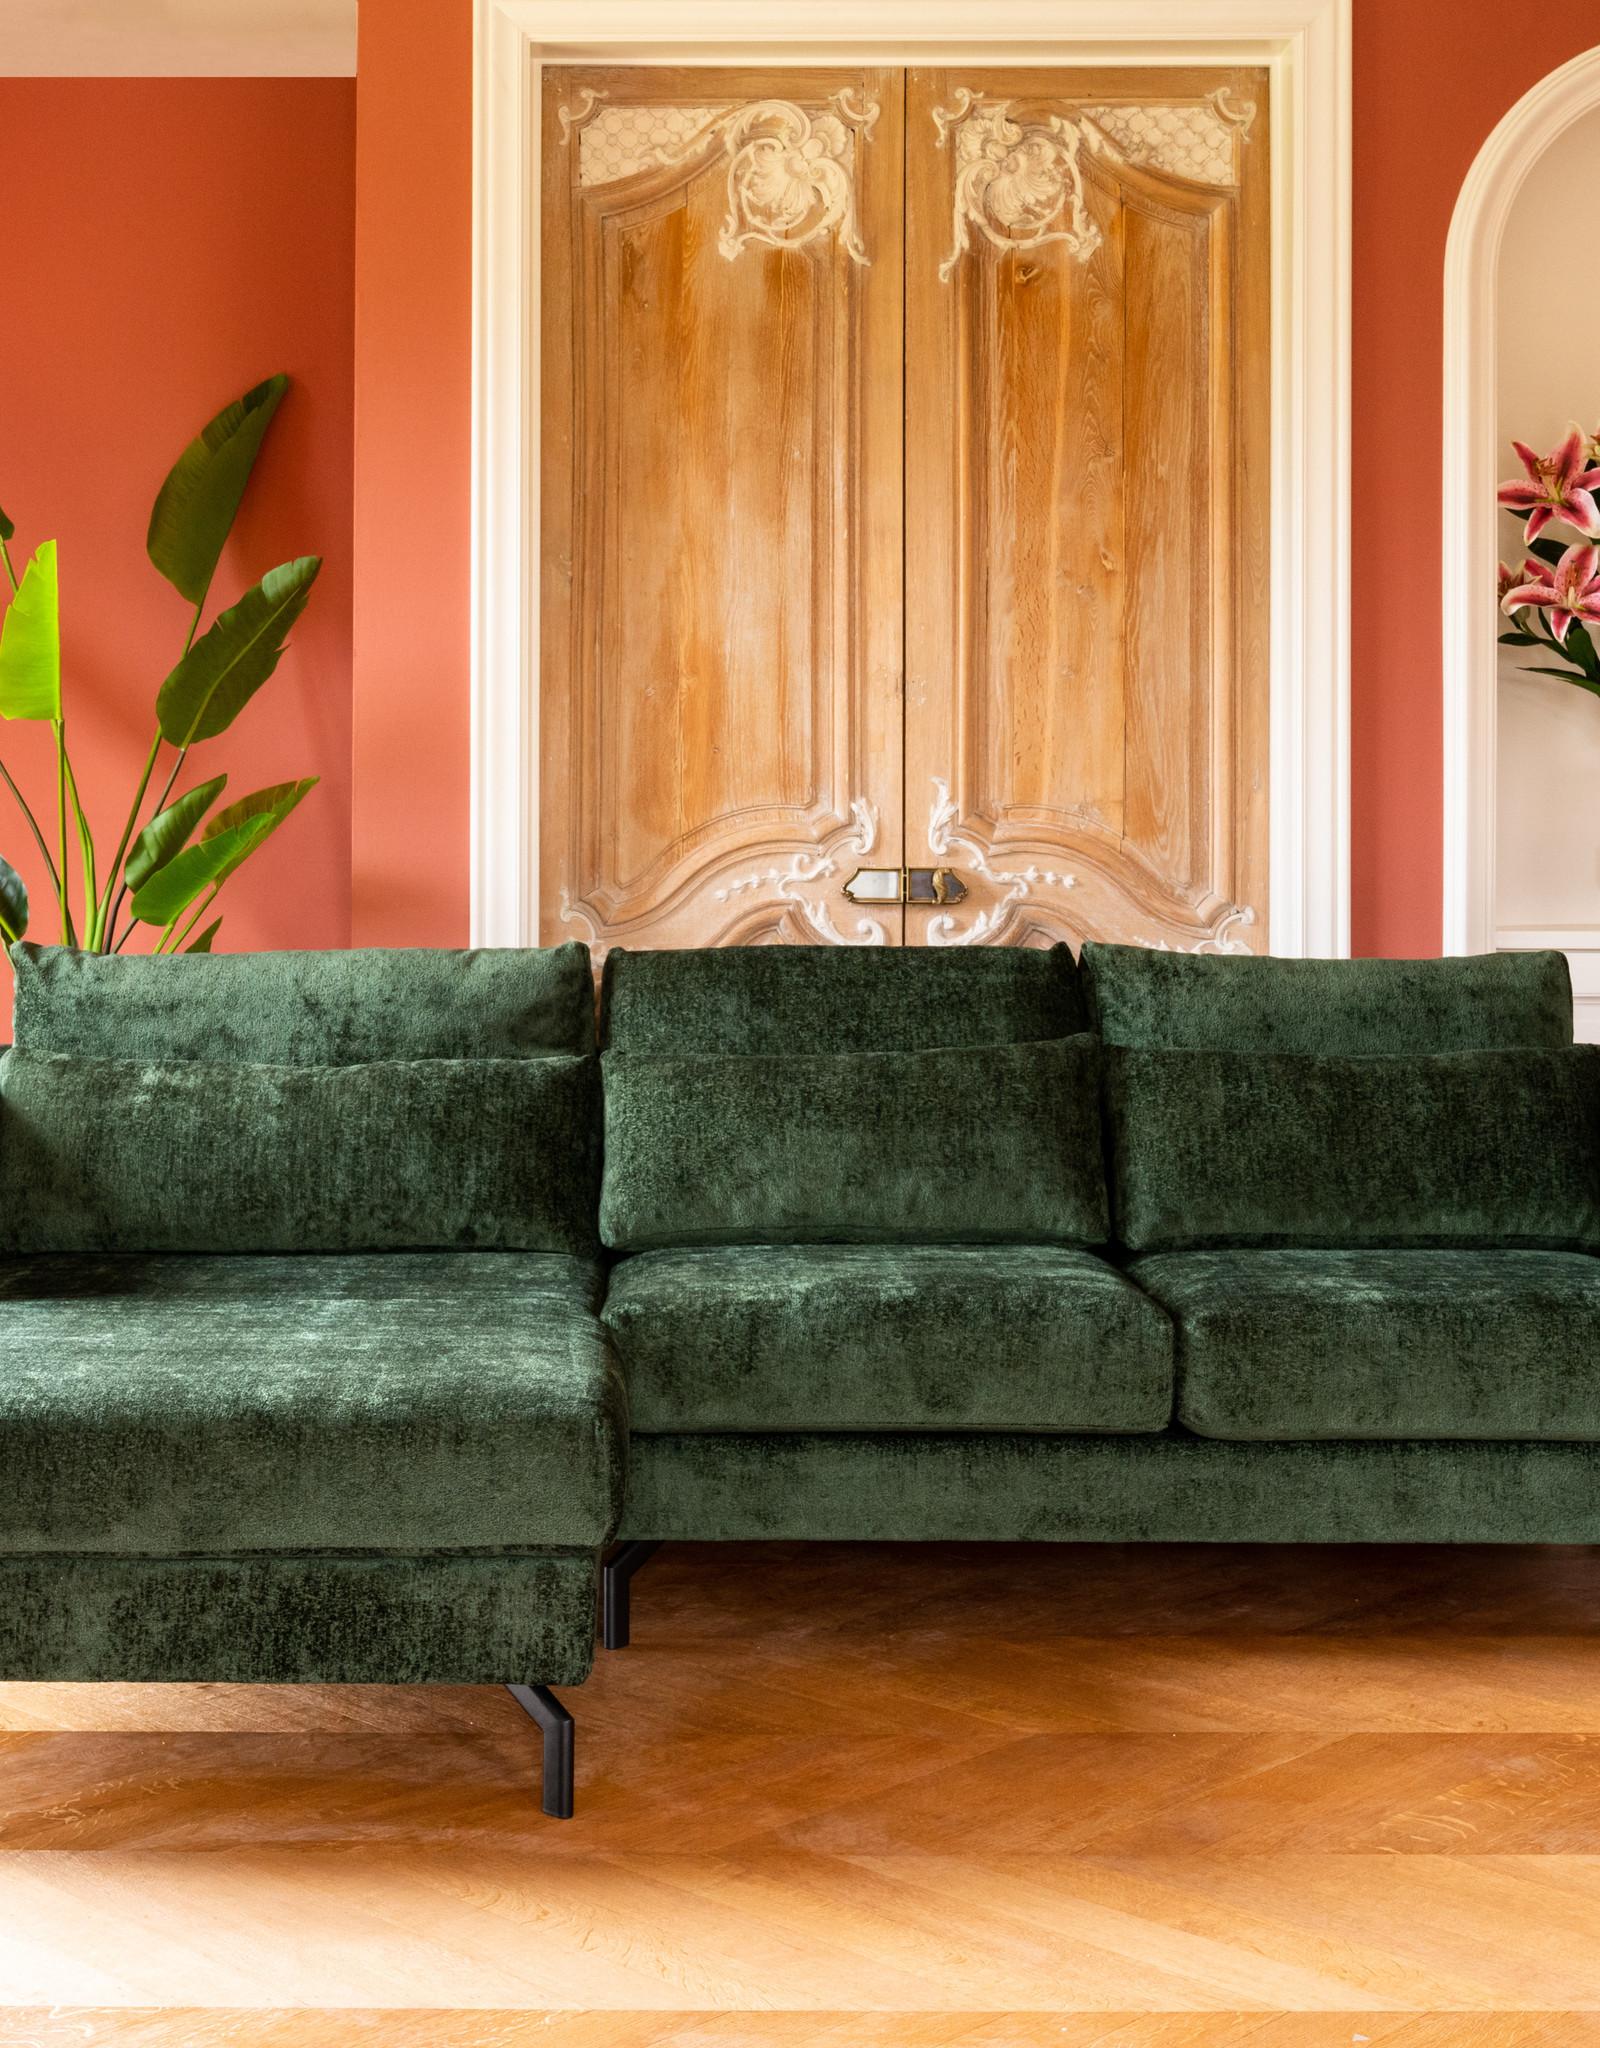 U&S sofa collection Lendekussen Coco - Stof Feel Me